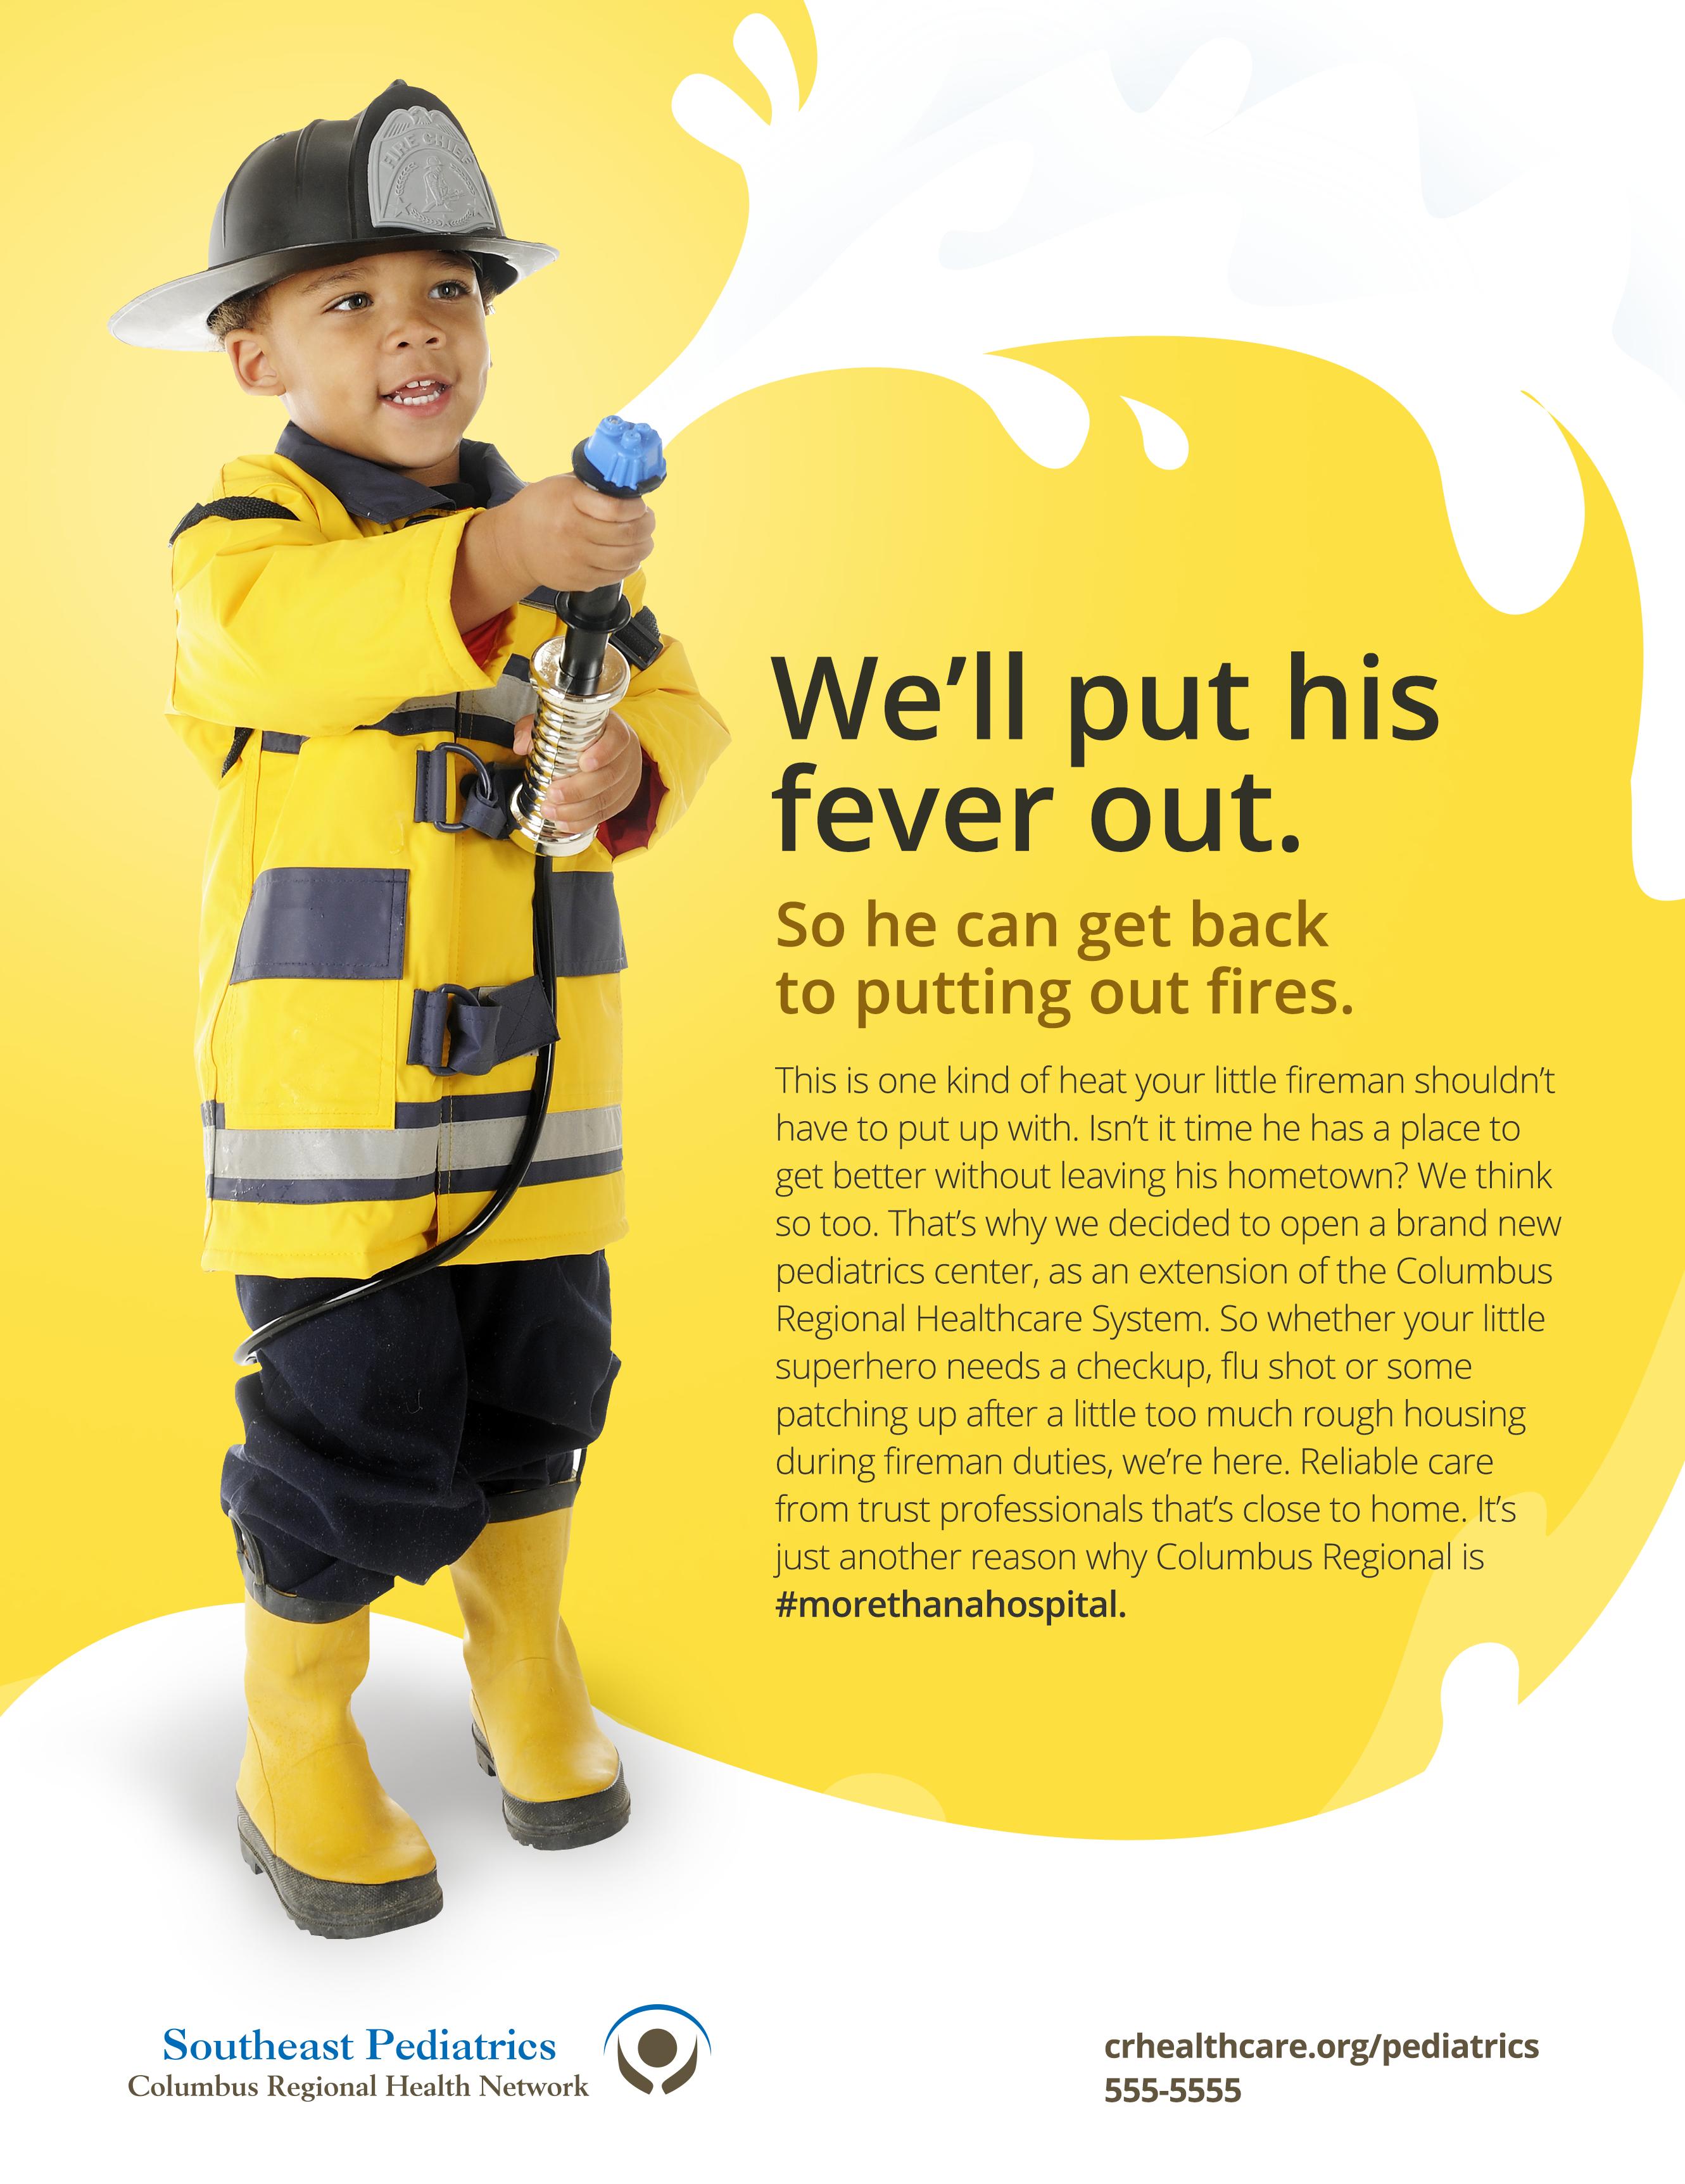 Design a bright, eye-catching ad for a new pediatrics center!